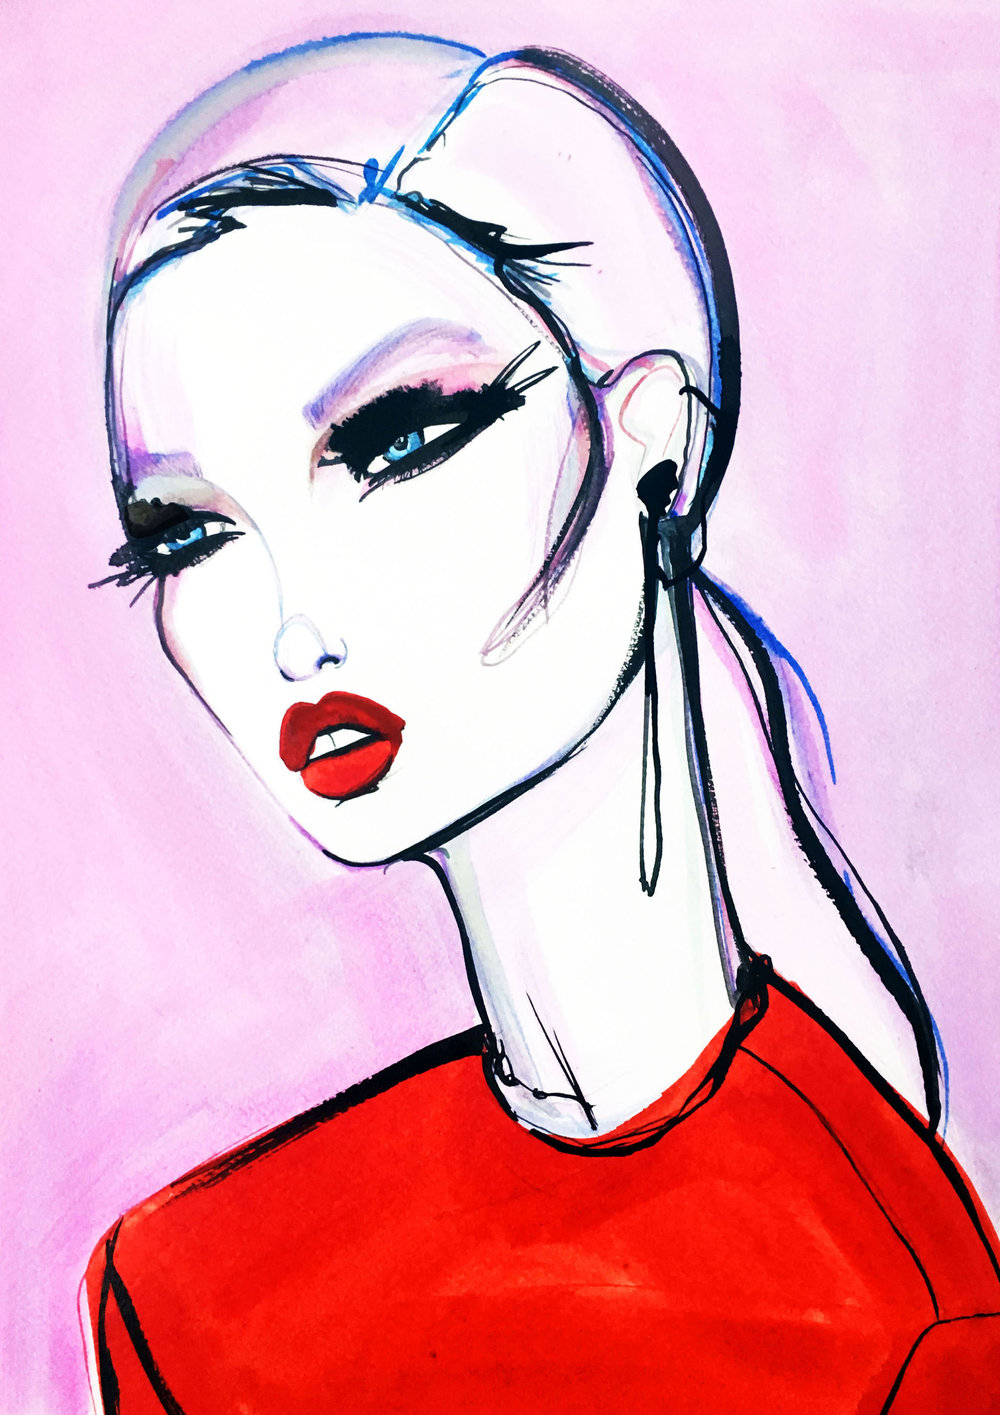 Flamingo - Mixed media painting on paperA3 (29.7x42cm)£400